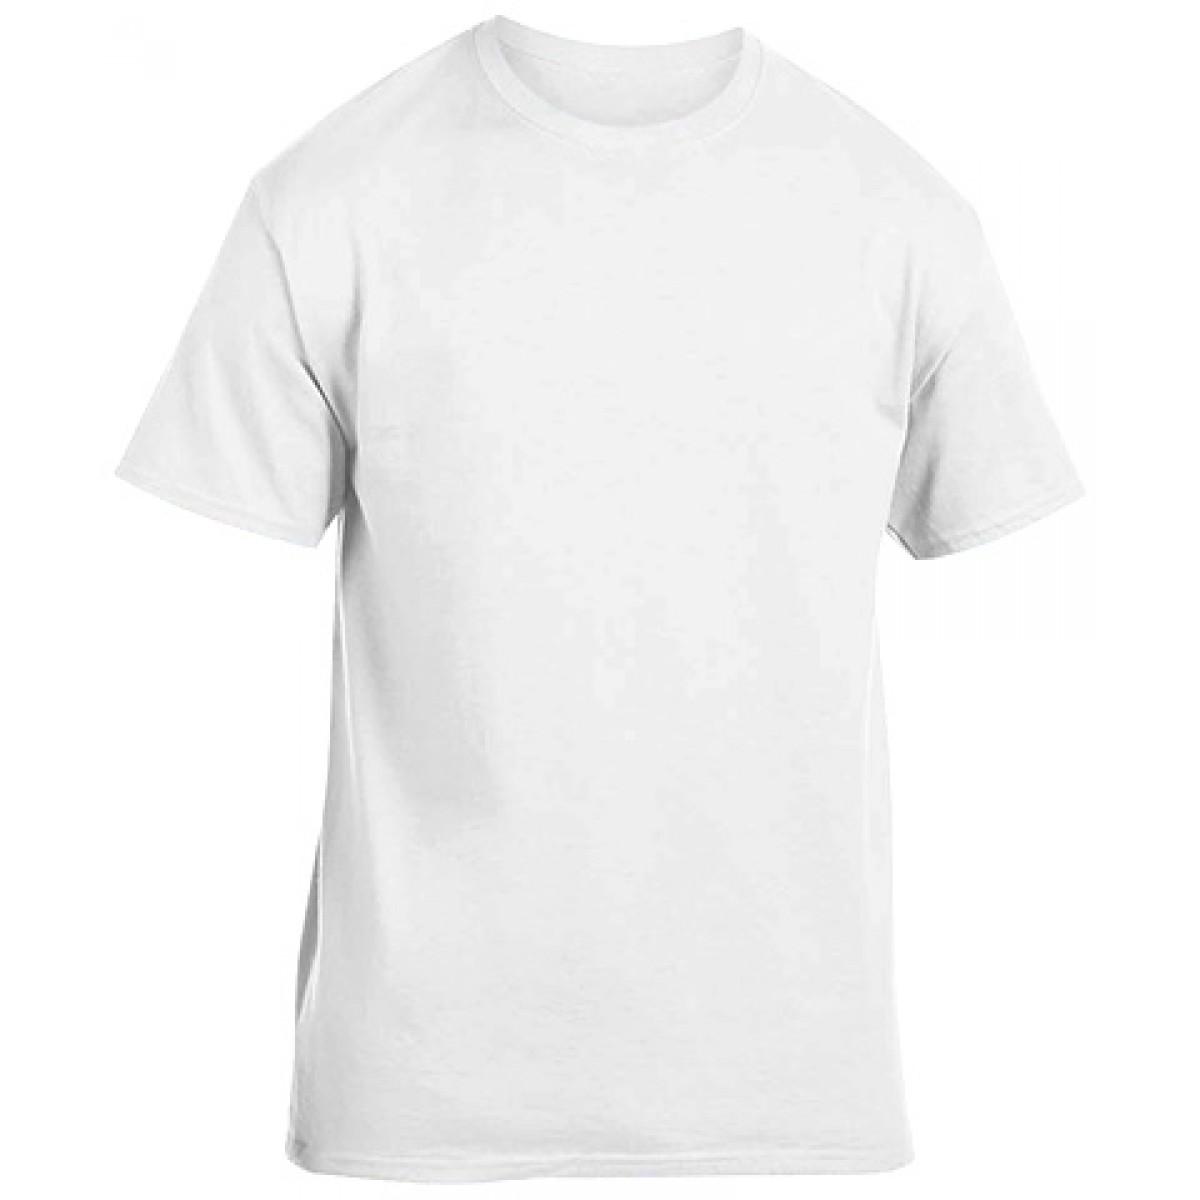 Soft 100% Cotton T-Shirt-White-YM